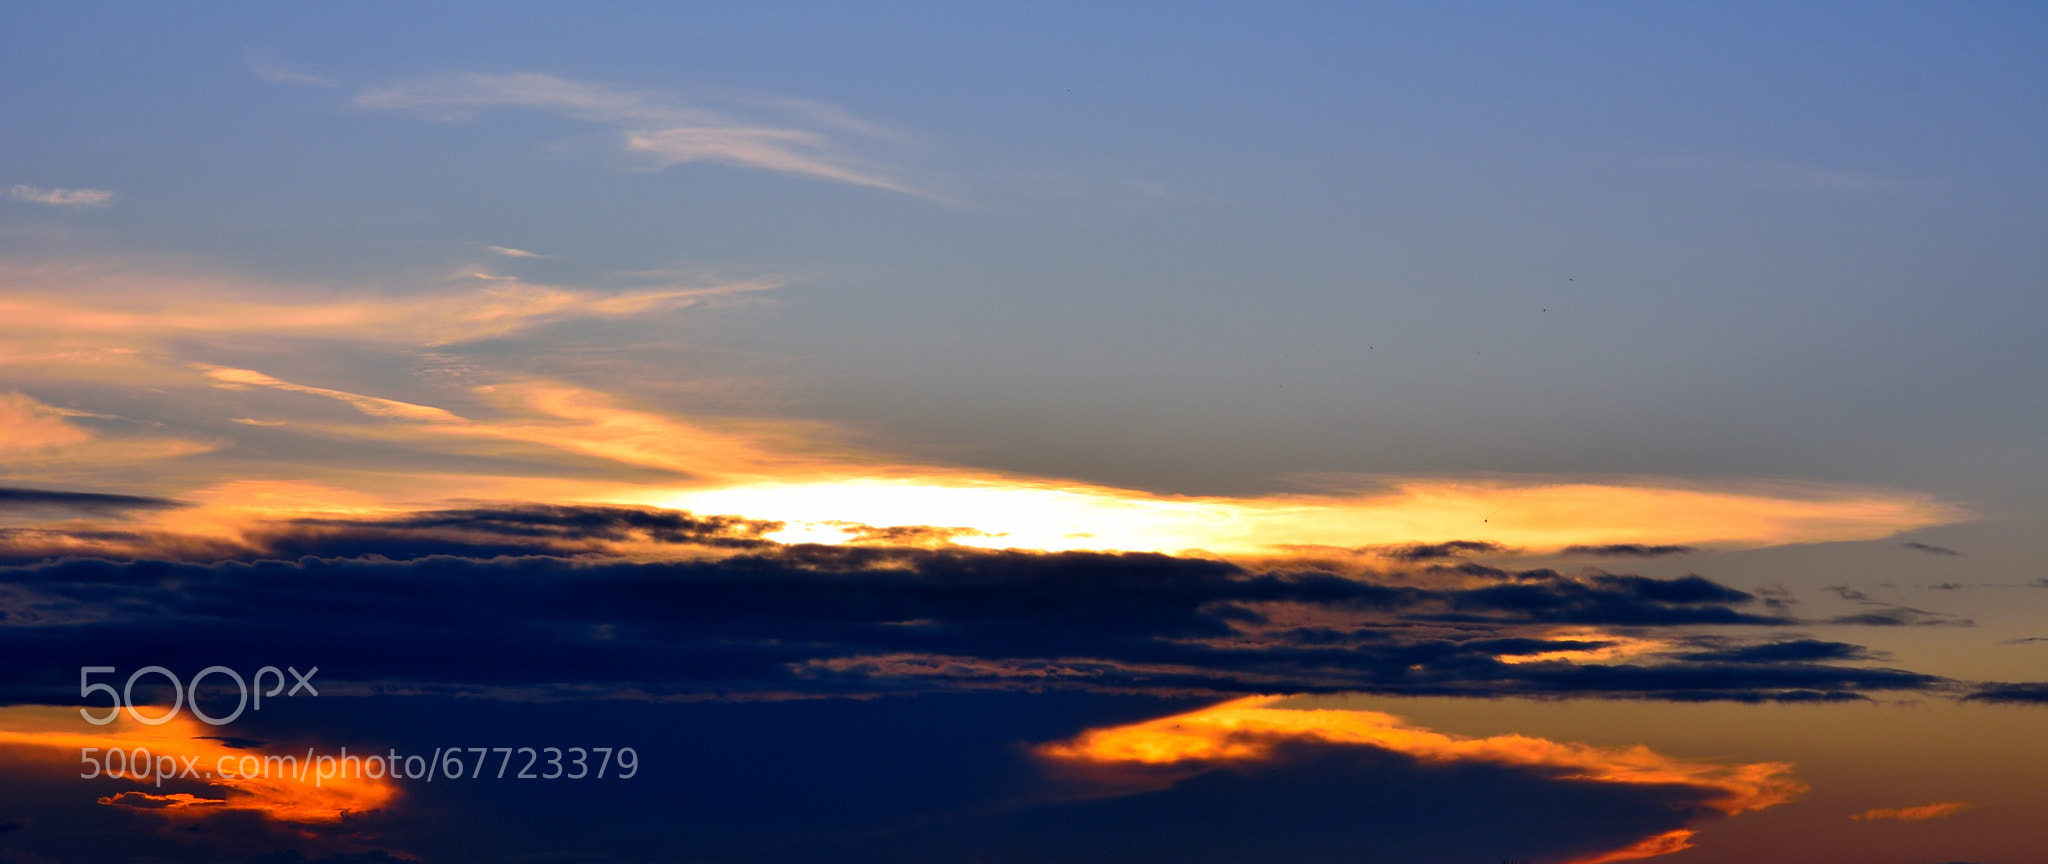 Photograph Sky by Helvio Silva on 500px